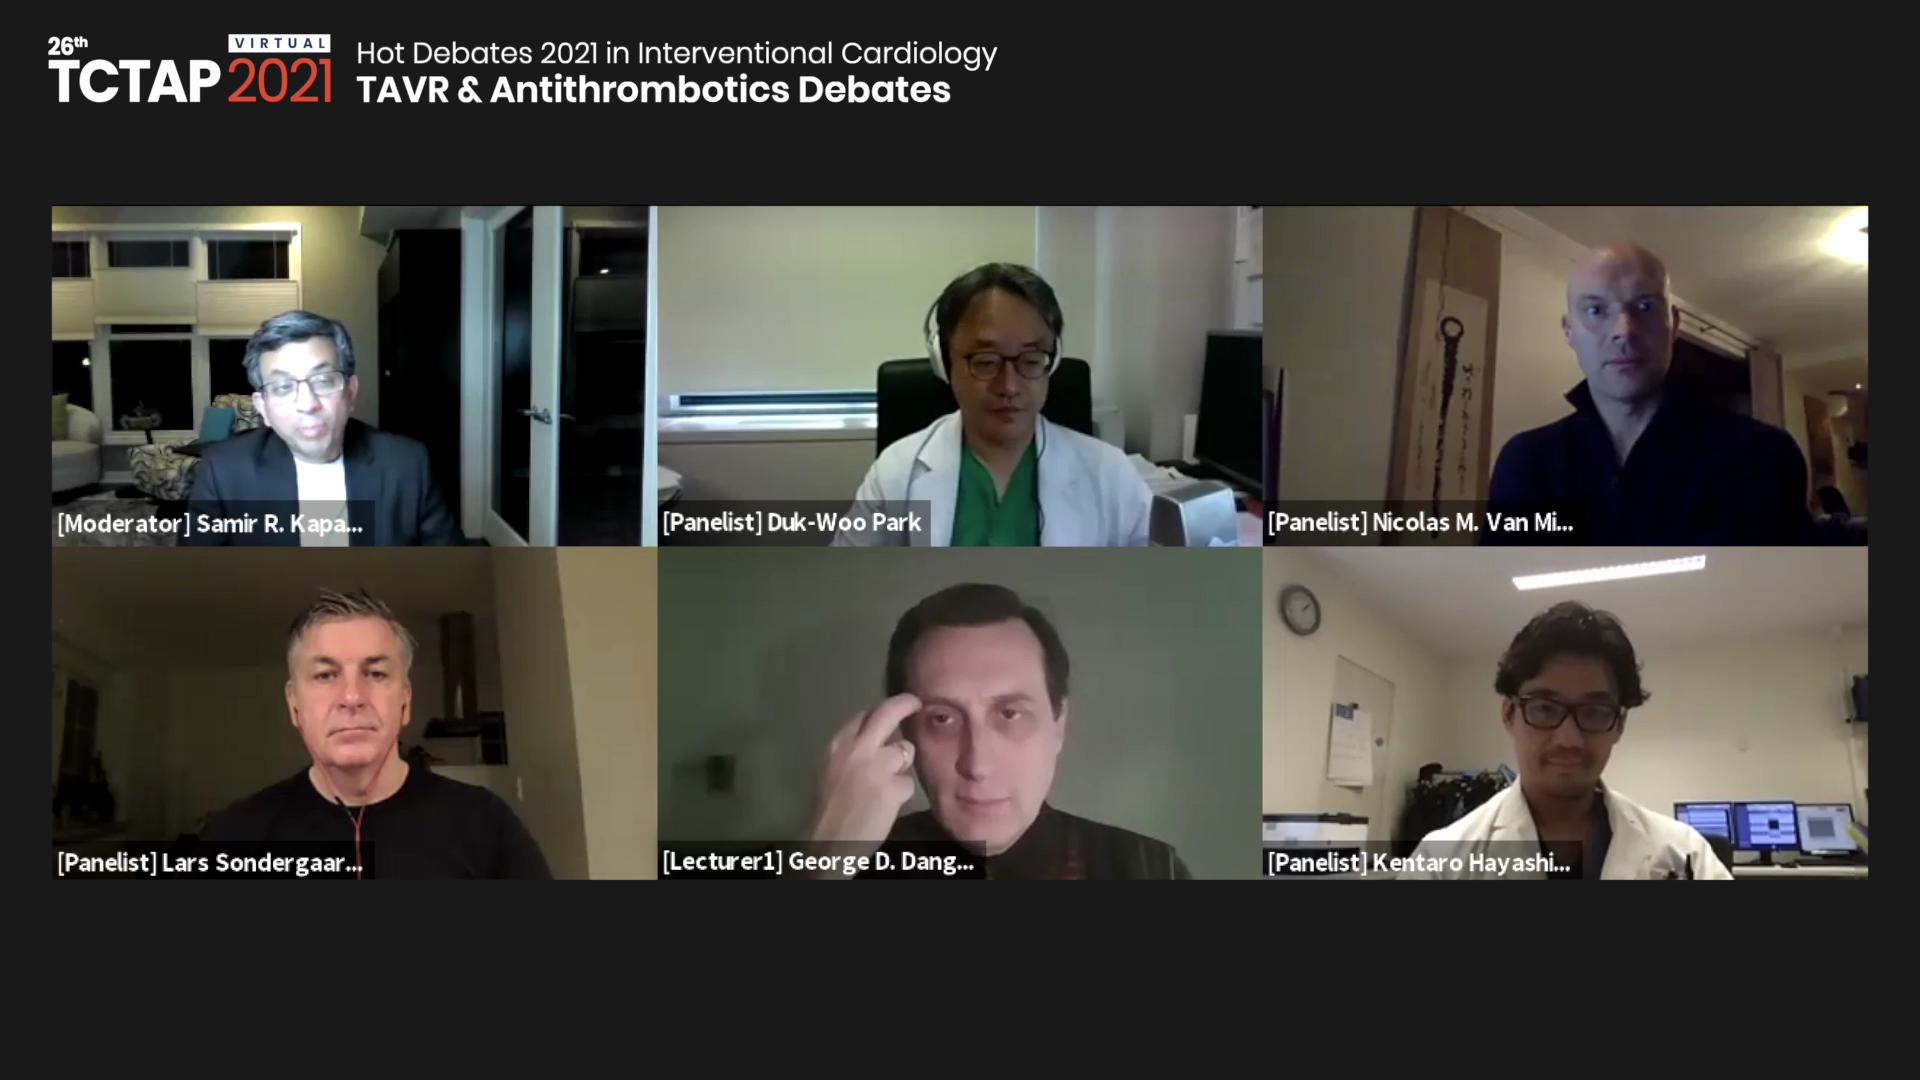 [TCTAP 2021 Virtual] Hot Debates 2021 in Interventional Cardiology - TAVR & Antithrombotics Debates